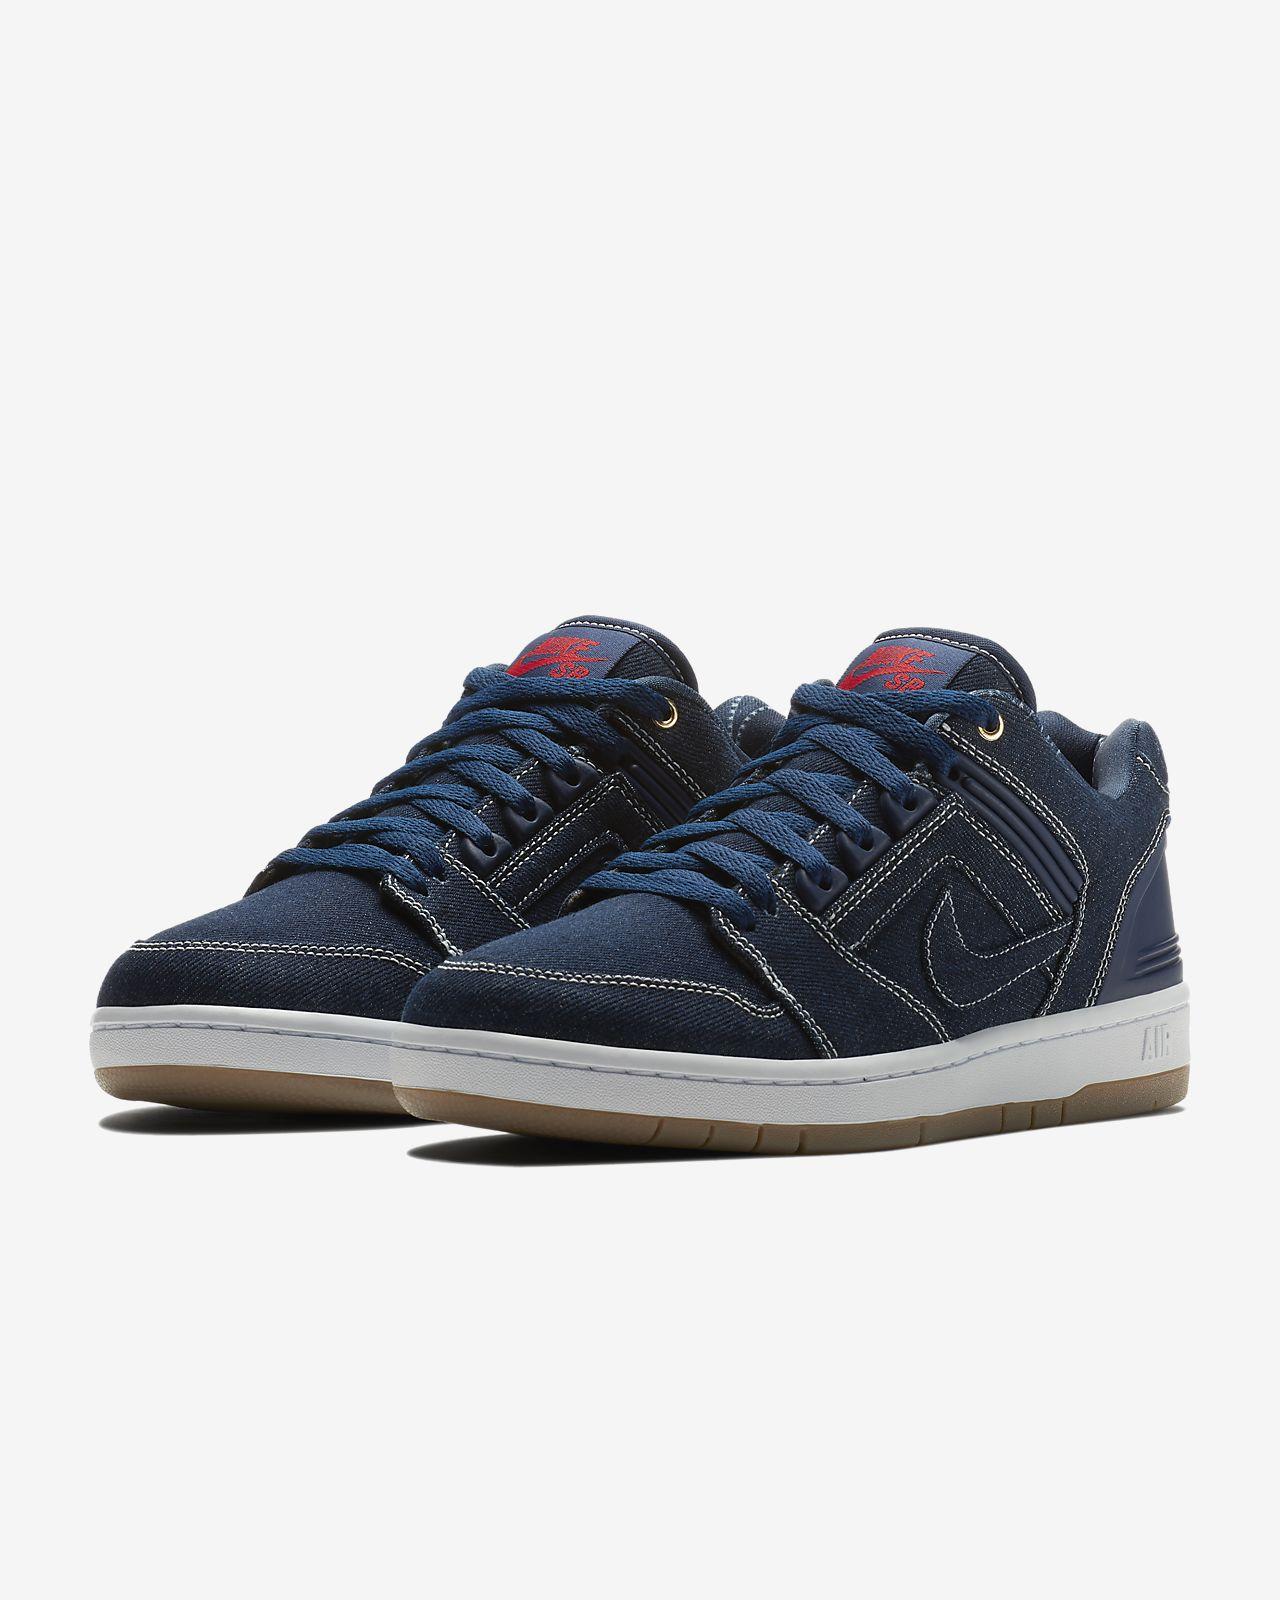 ... Nike SB Air Force II Low Men's Skateboarding Shoe